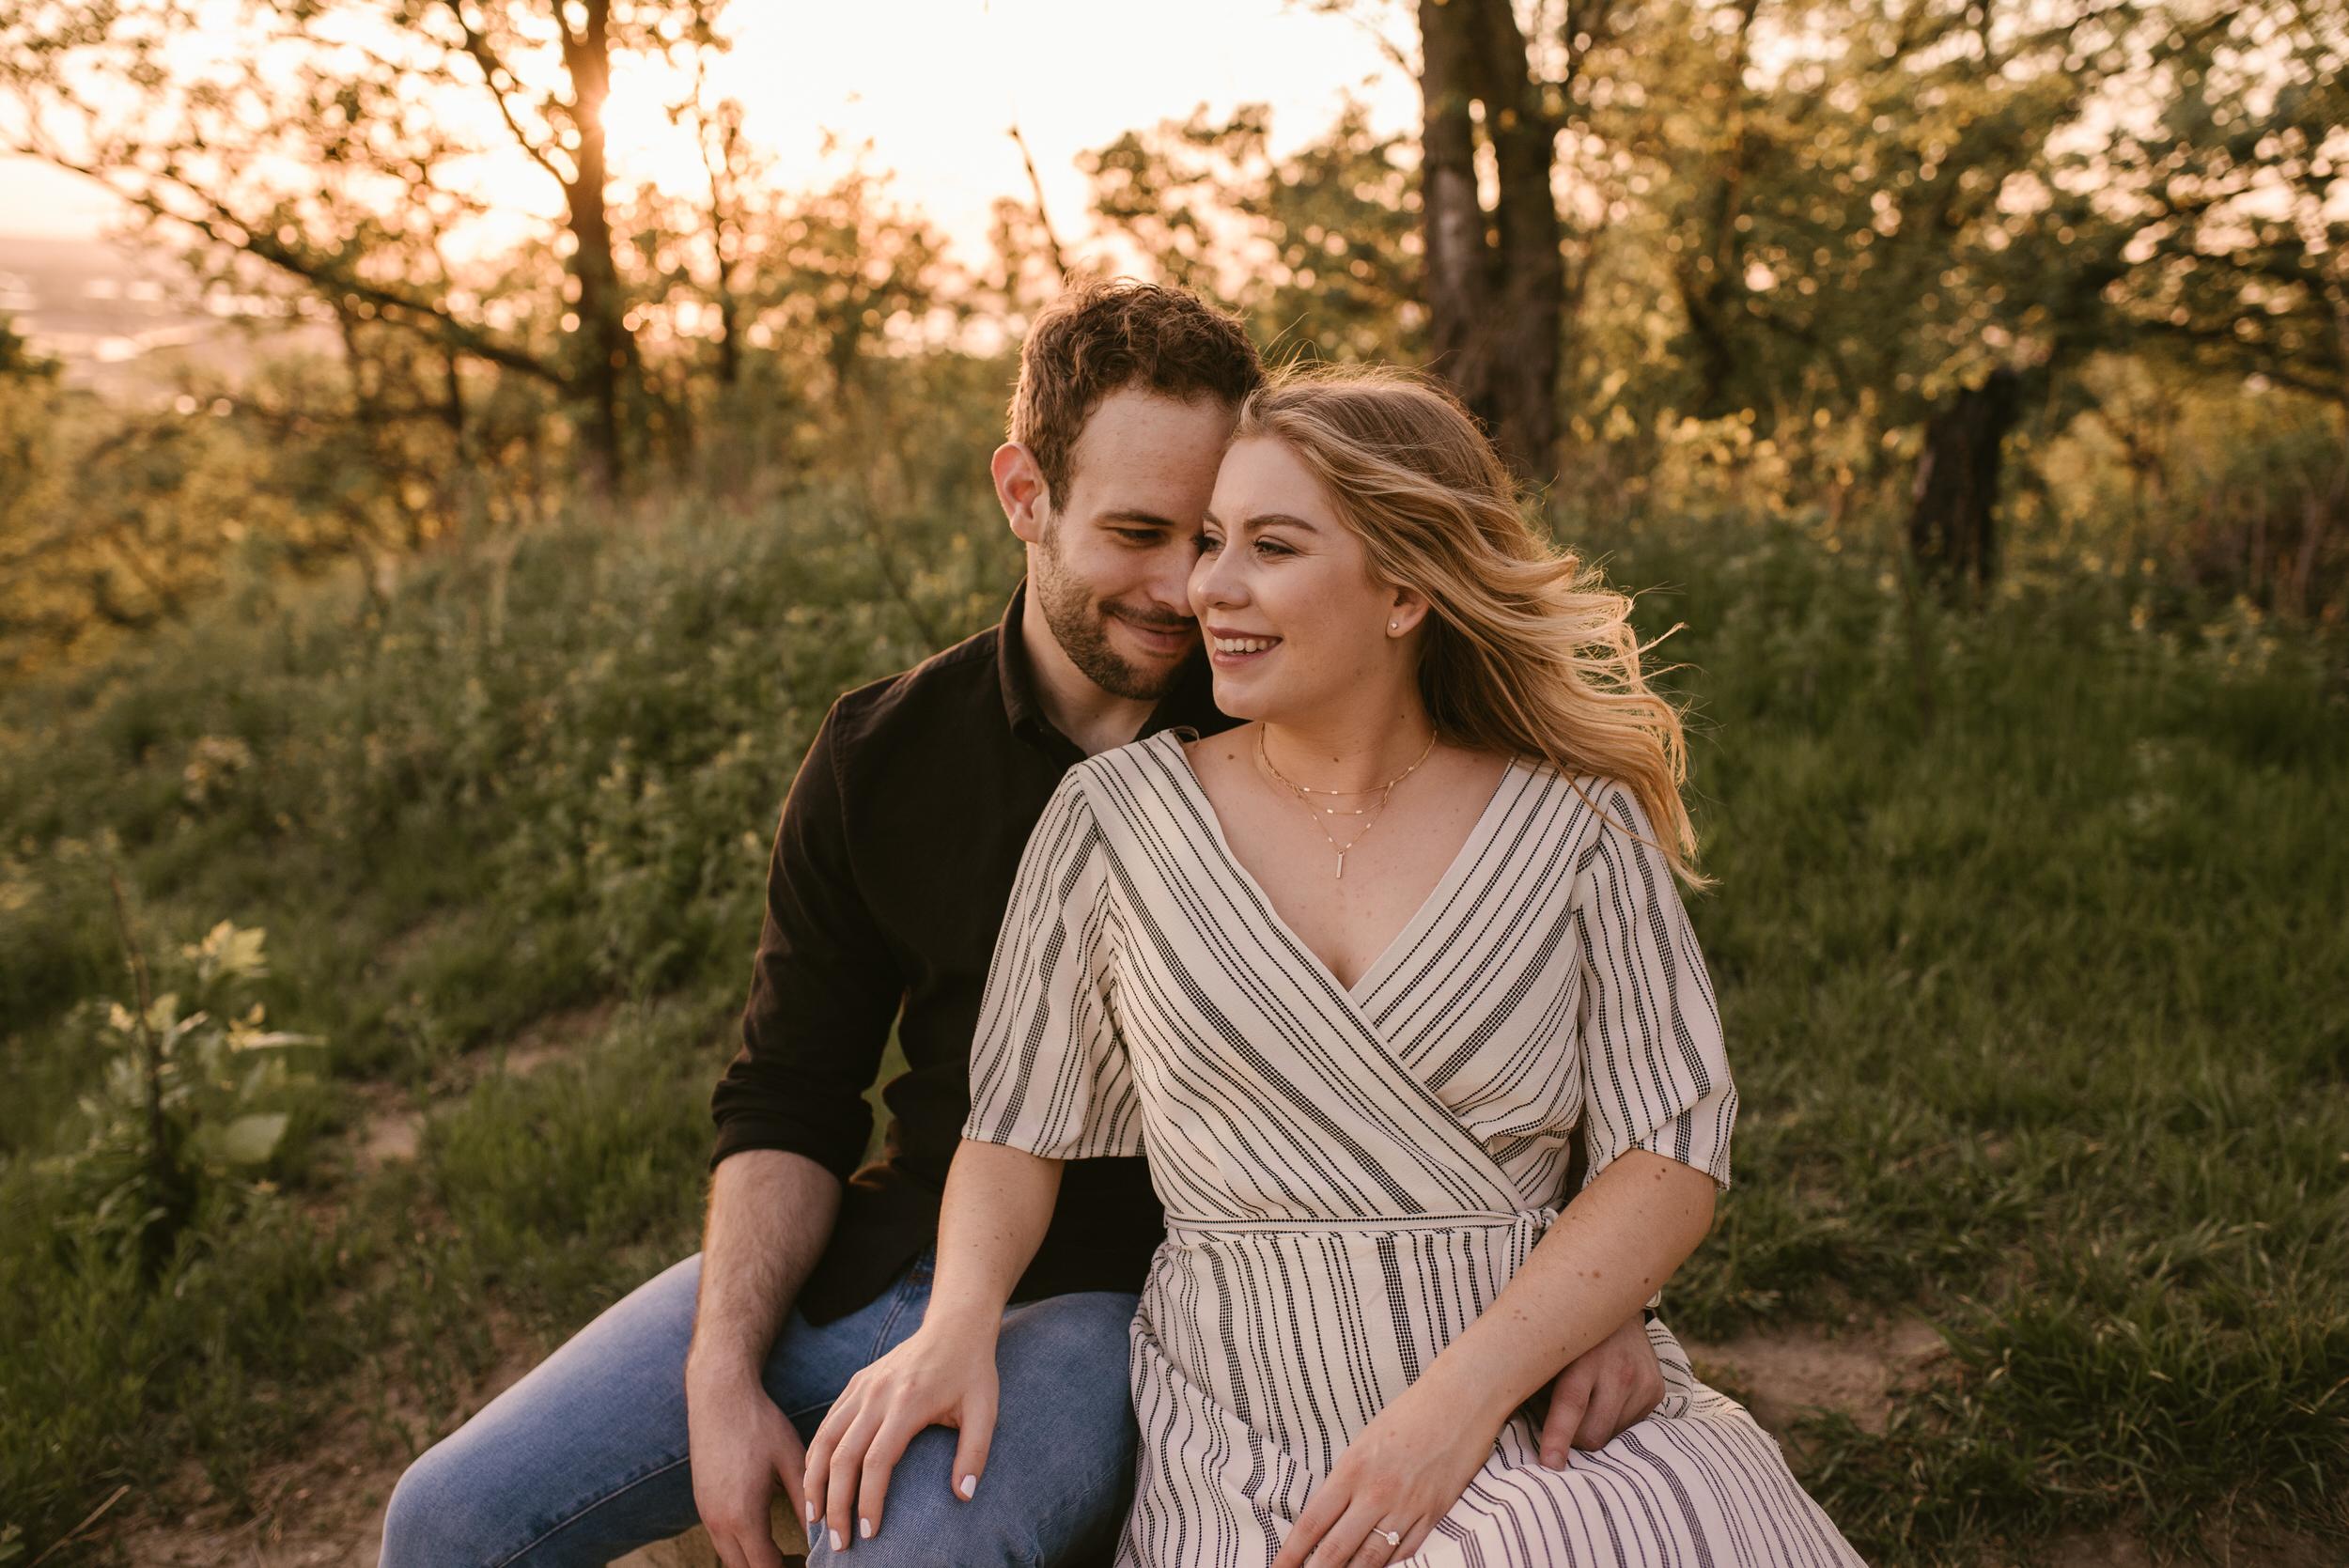 Omaha-Nebraska-Engagement-Session-Kaylie-Sirek-Photography-144.jpg